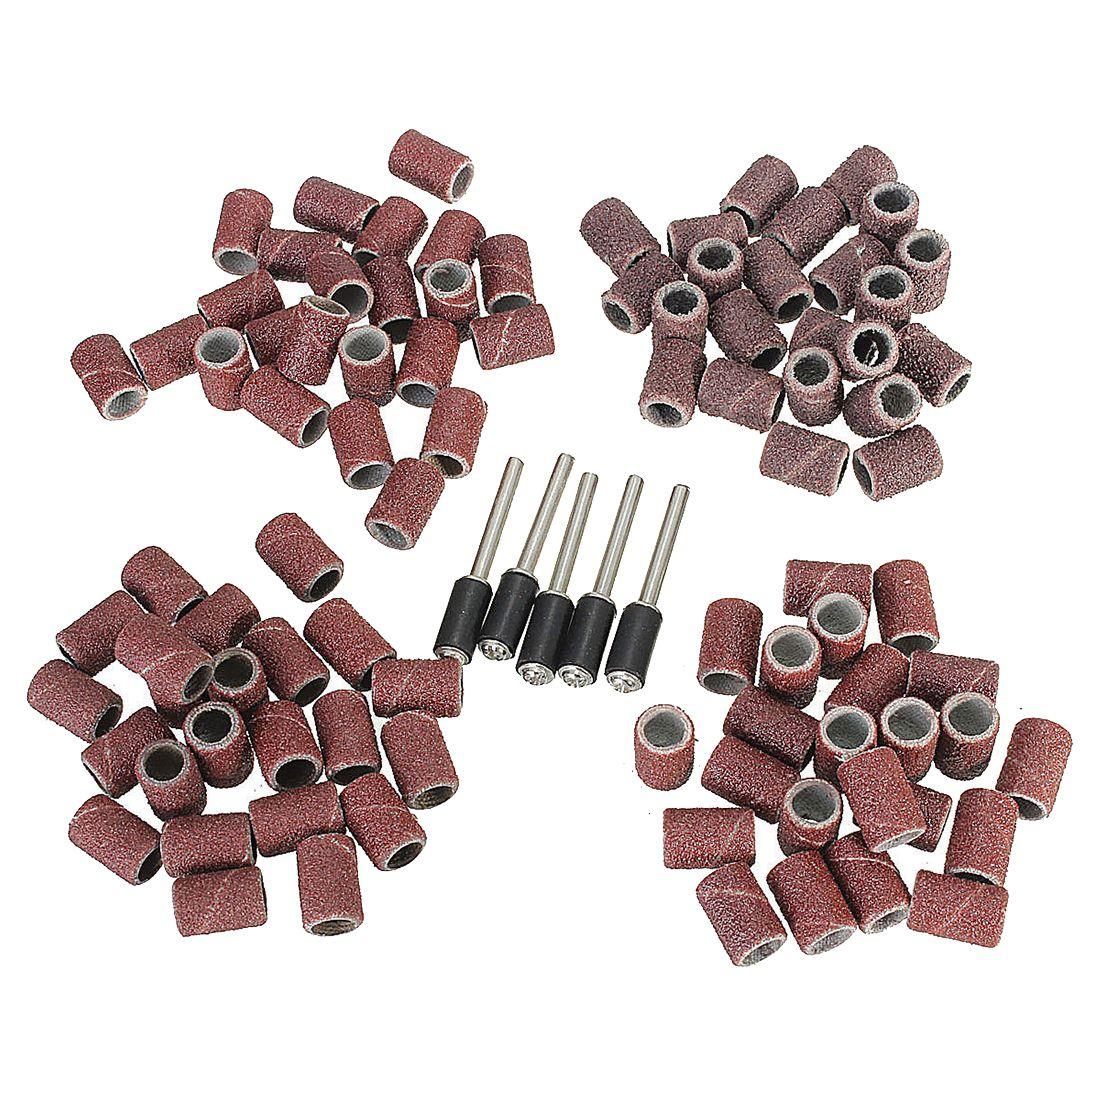 HLZS-92Pcs bandas de lijado de 1/4 pulgadas, manguitos de tambor 60 120 240 320, lijas + juego de 5 mandril